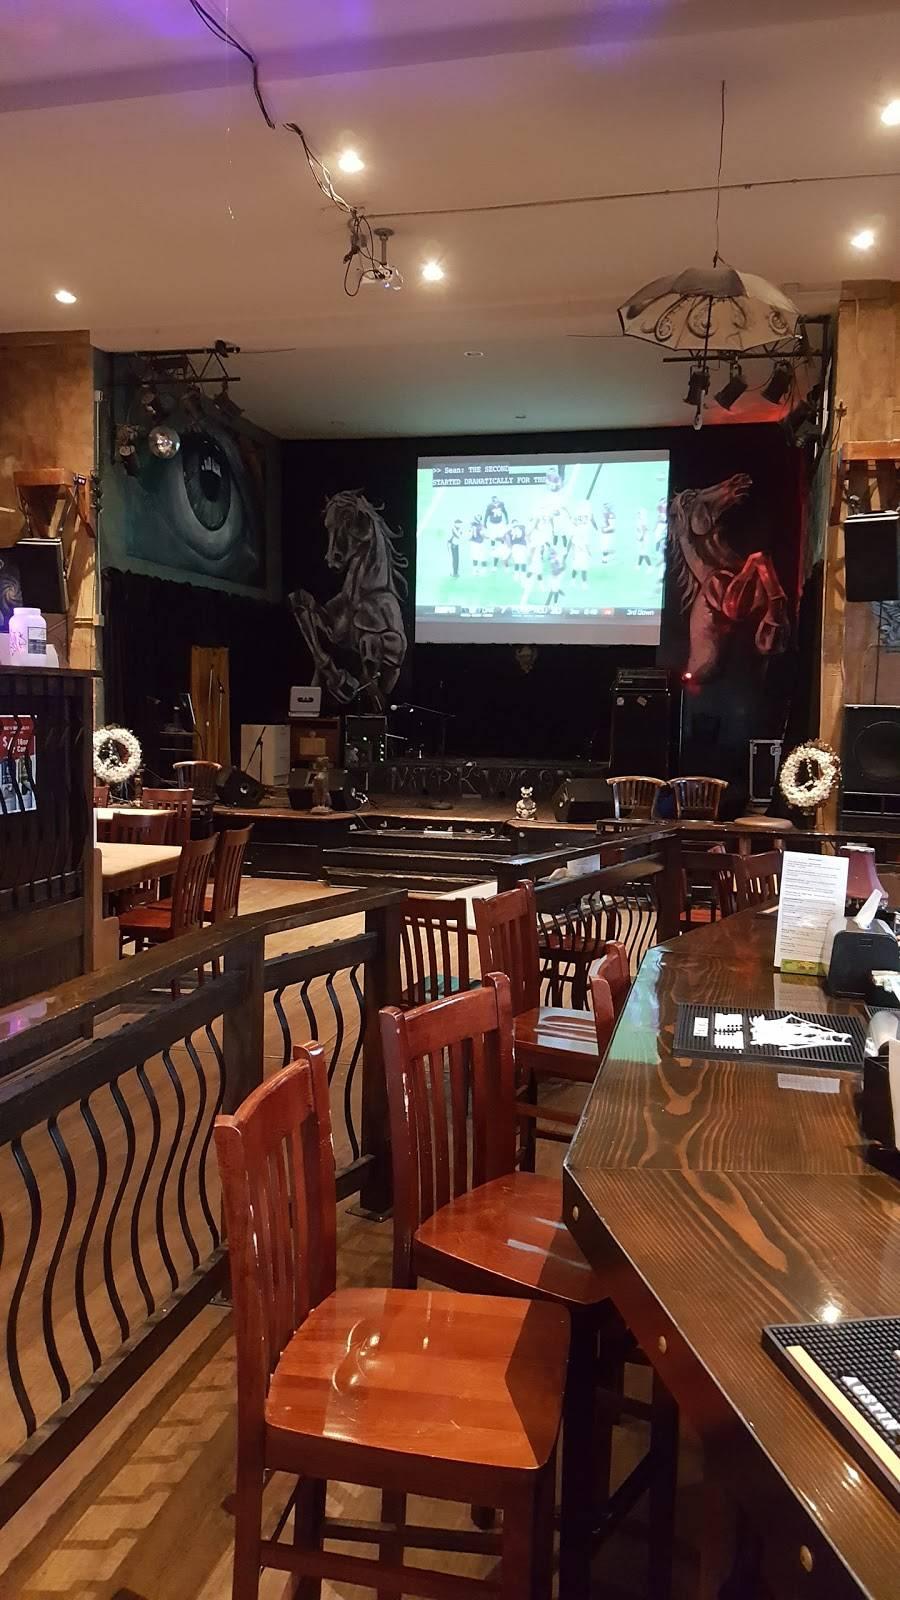 Mirkwood Public House   restaurant   117 E Division St, Arlington, WA 98223, USA   3604039020 OR +1 360-403-9020